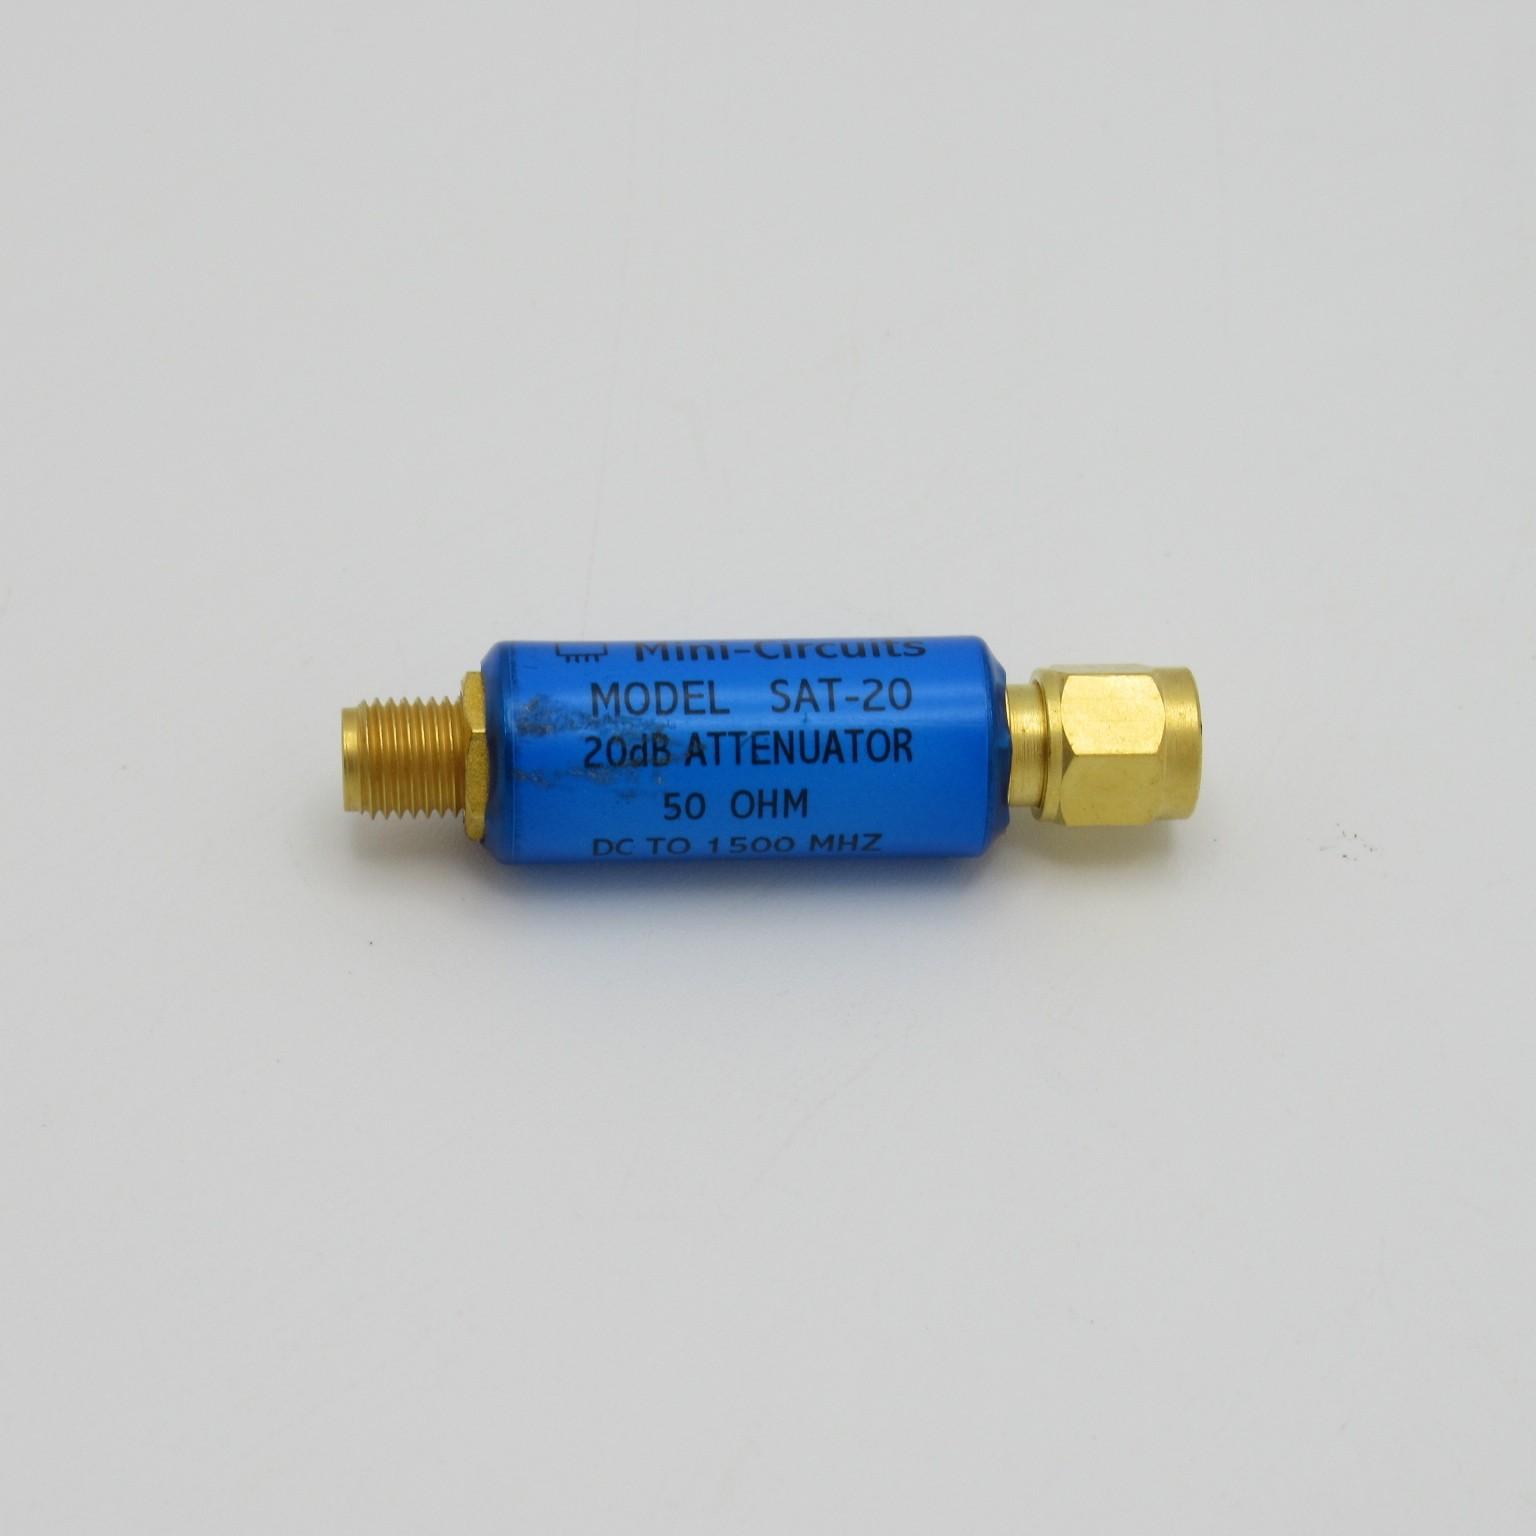 SMA F//M DC 50Ω 18000 MHz Mini-Circuits BW-S20W5+ 20db Attenuator